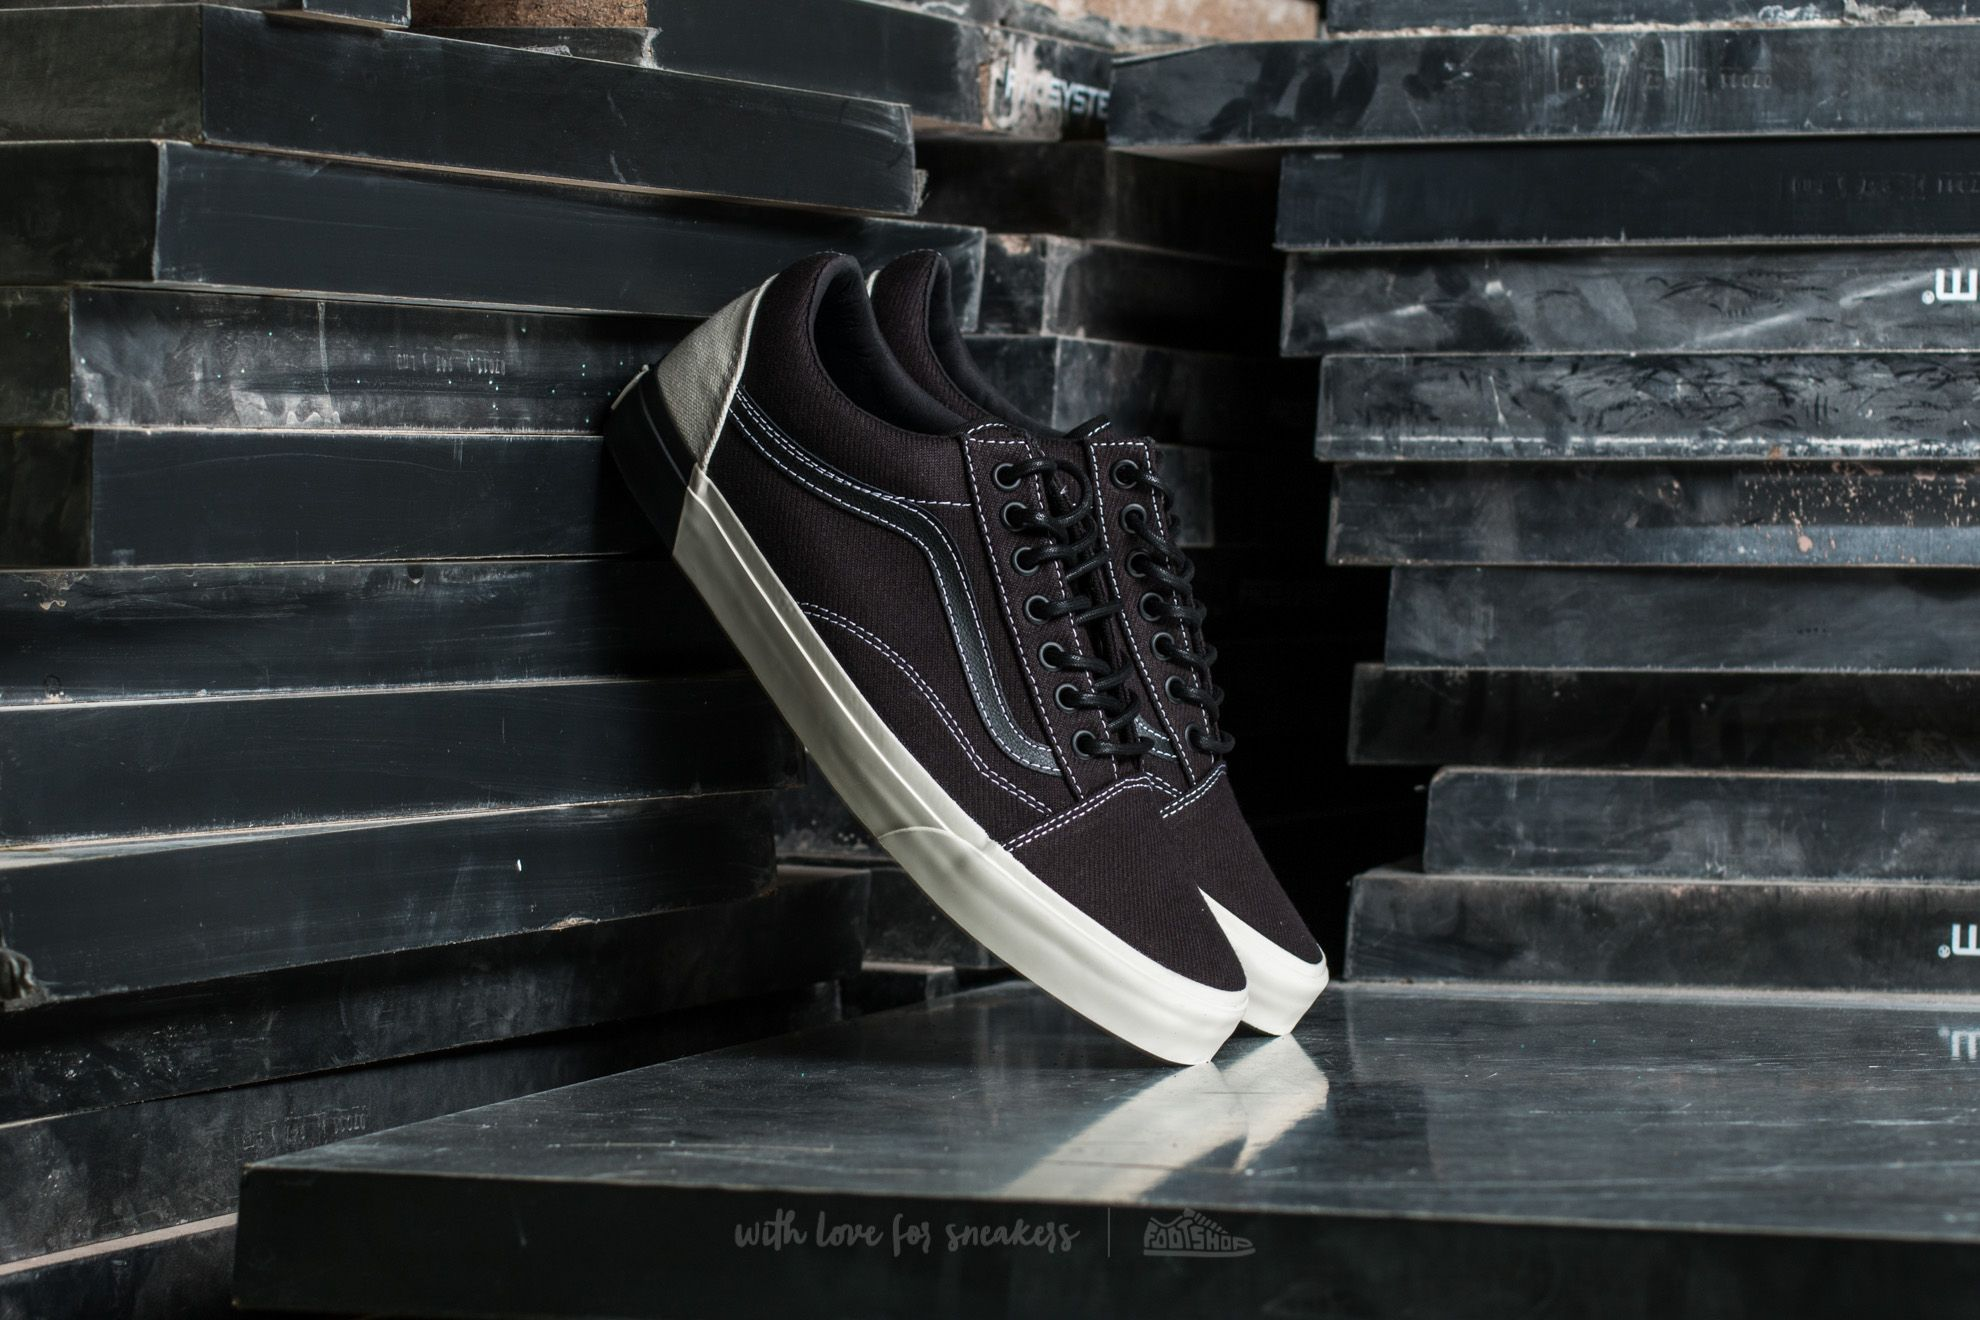 Men's shoes Vans Old Skool DX (Blocked